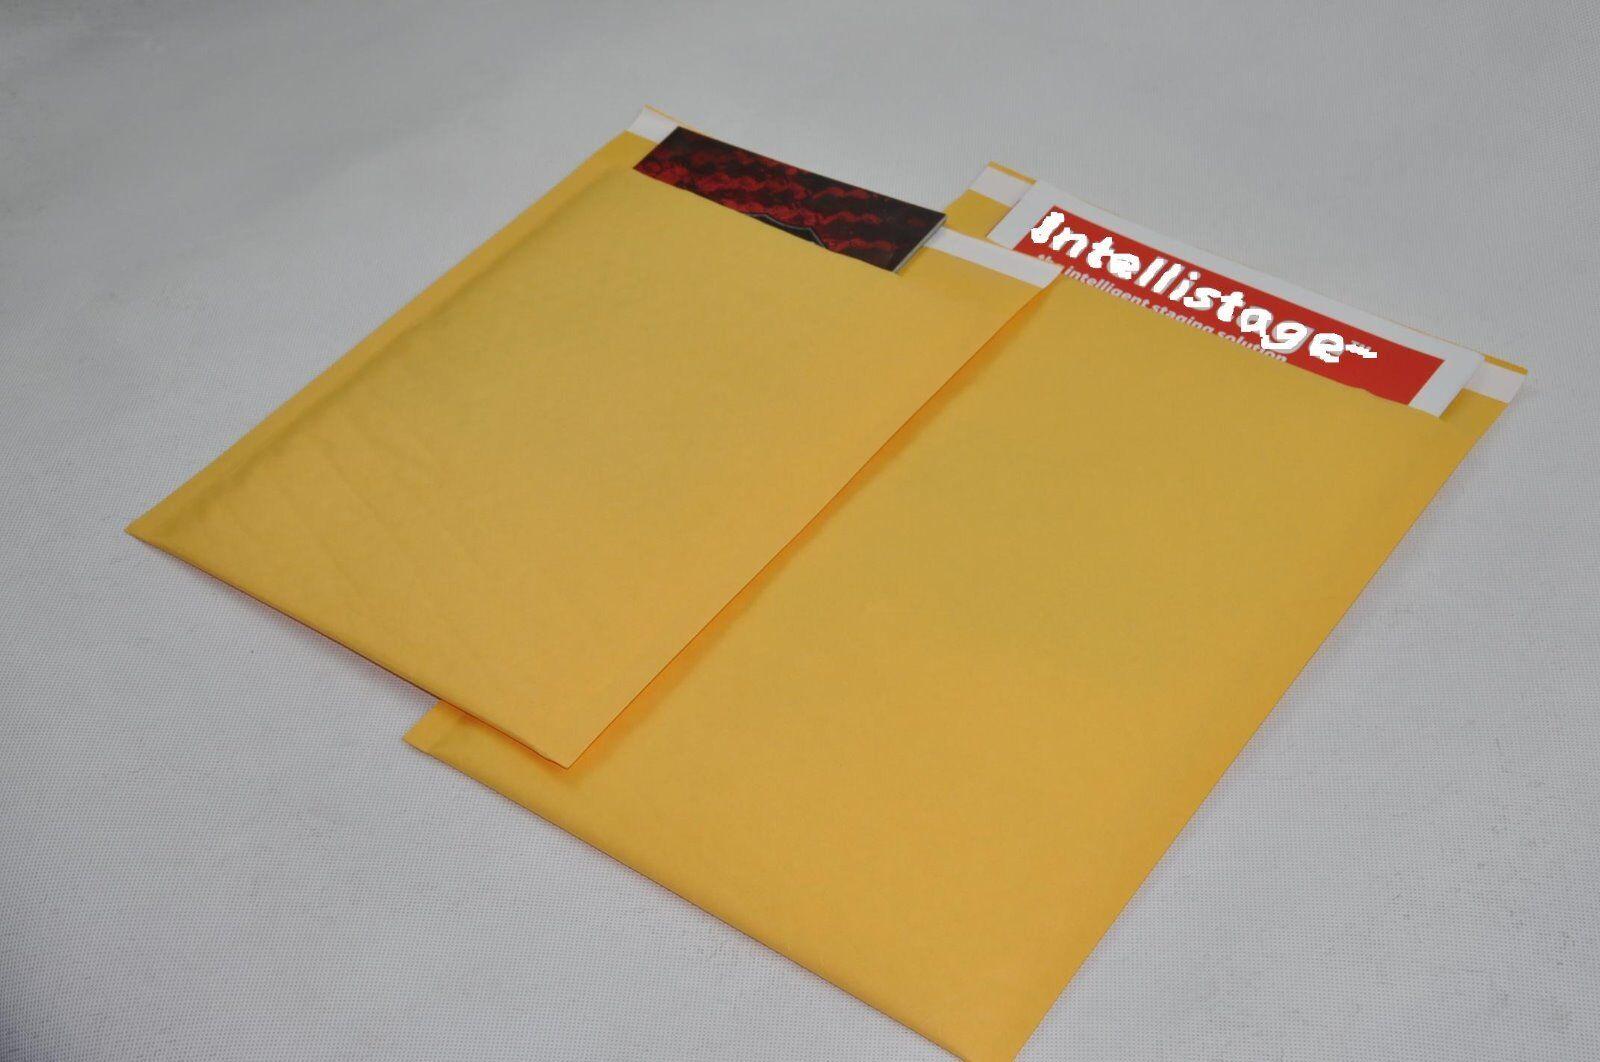 "100 #0000 4x6 /""PMG/"" Kraft Bubble Mailers Self Seal Padded Envelops 4/"" x 6/"""